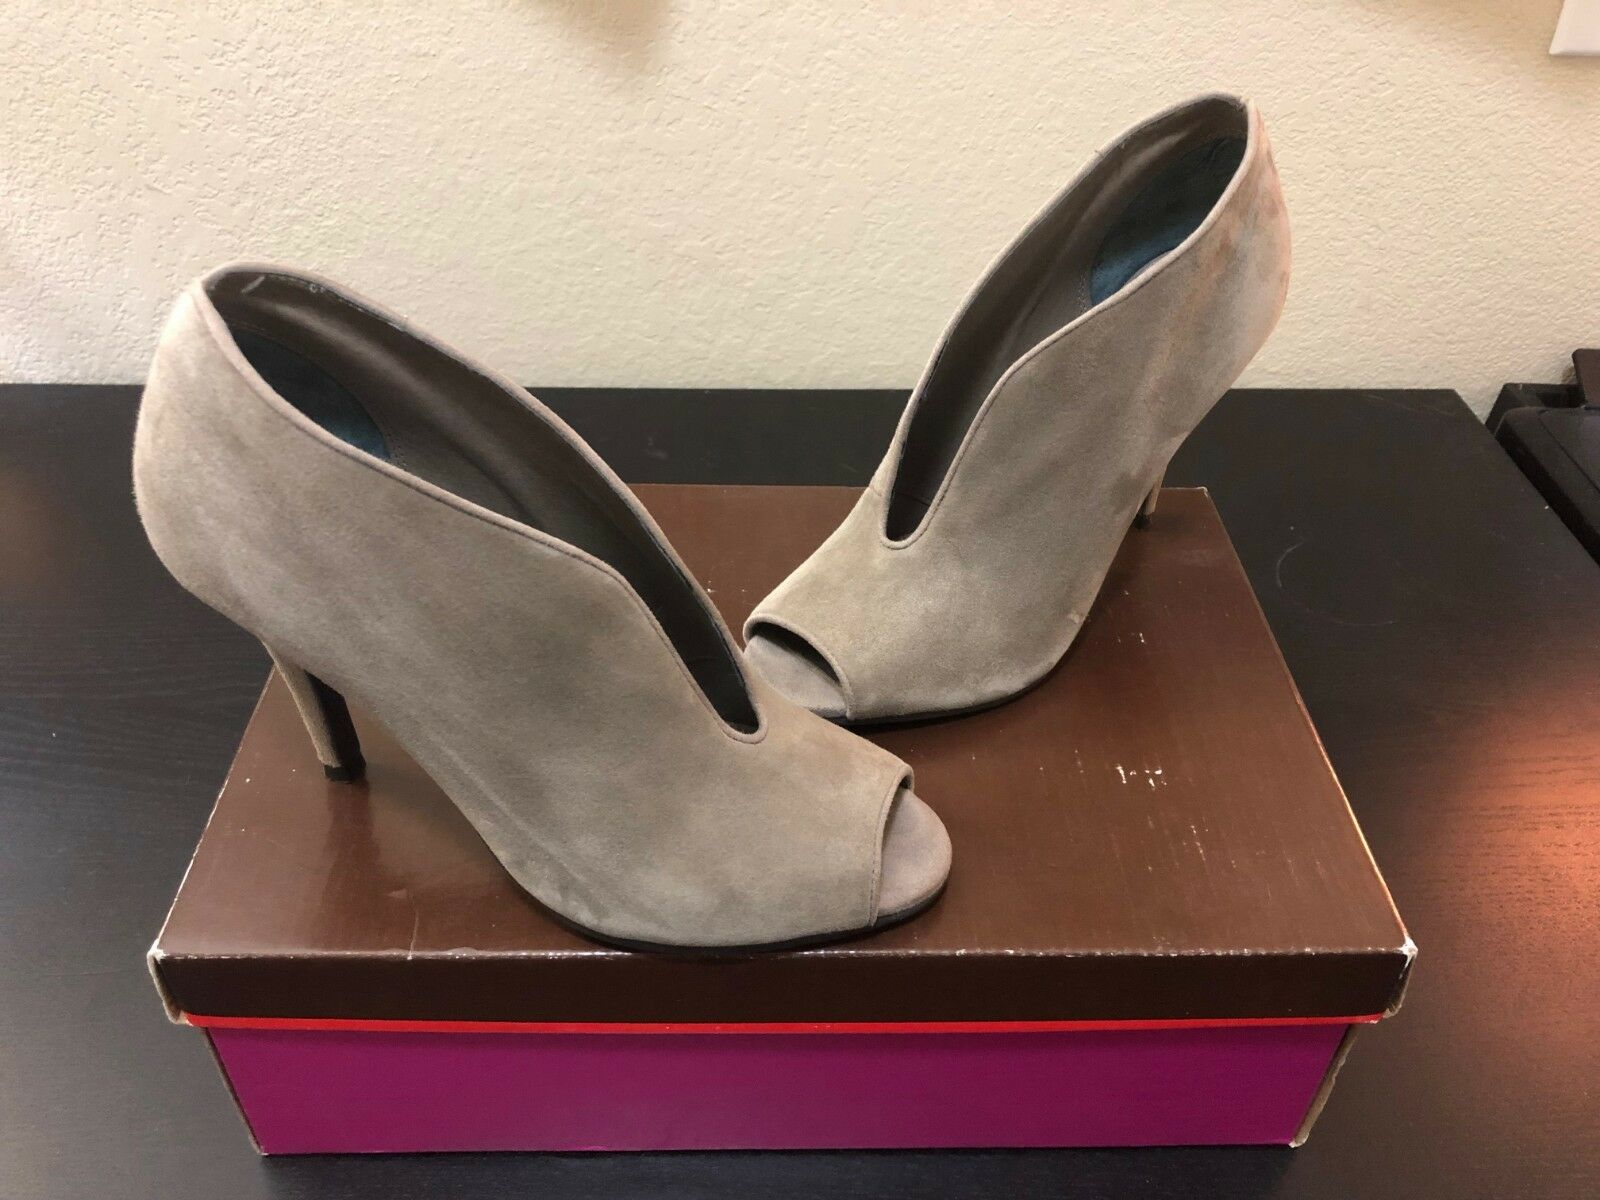 Tesori Kerry-Lea Women's Peep-toe Gray Suede Ankle Boots/Booties Size 6